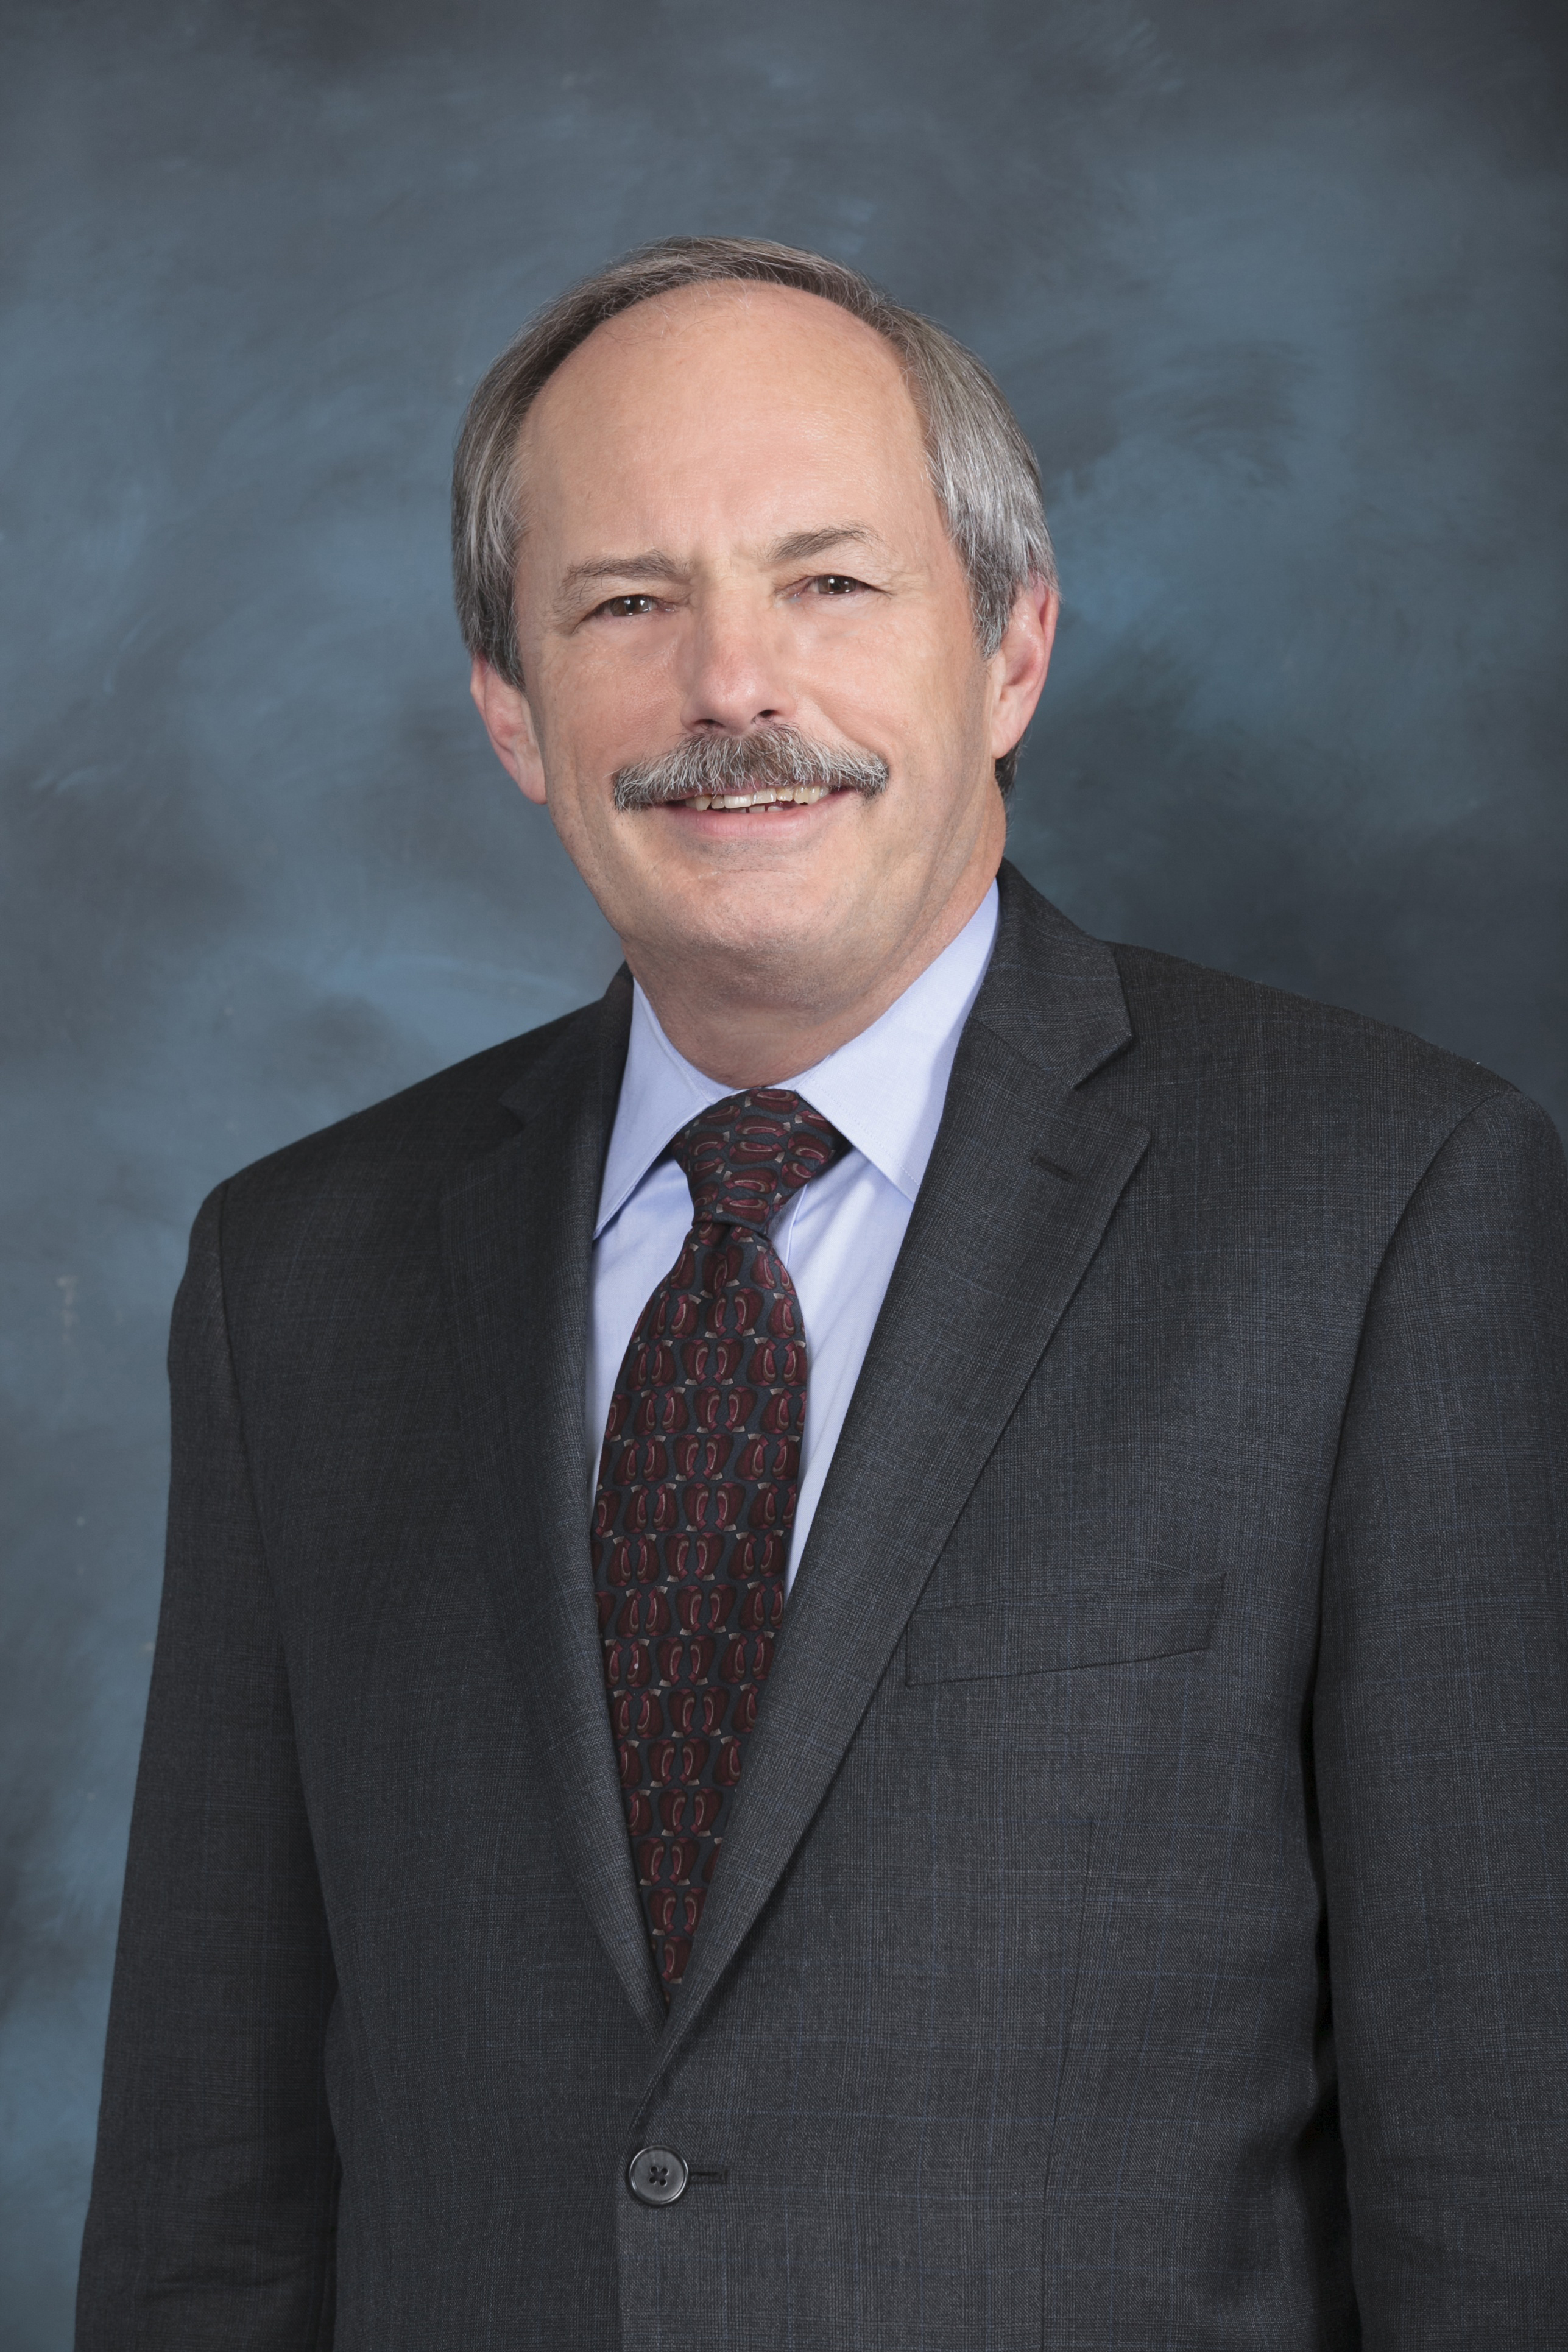 Alan Carlson